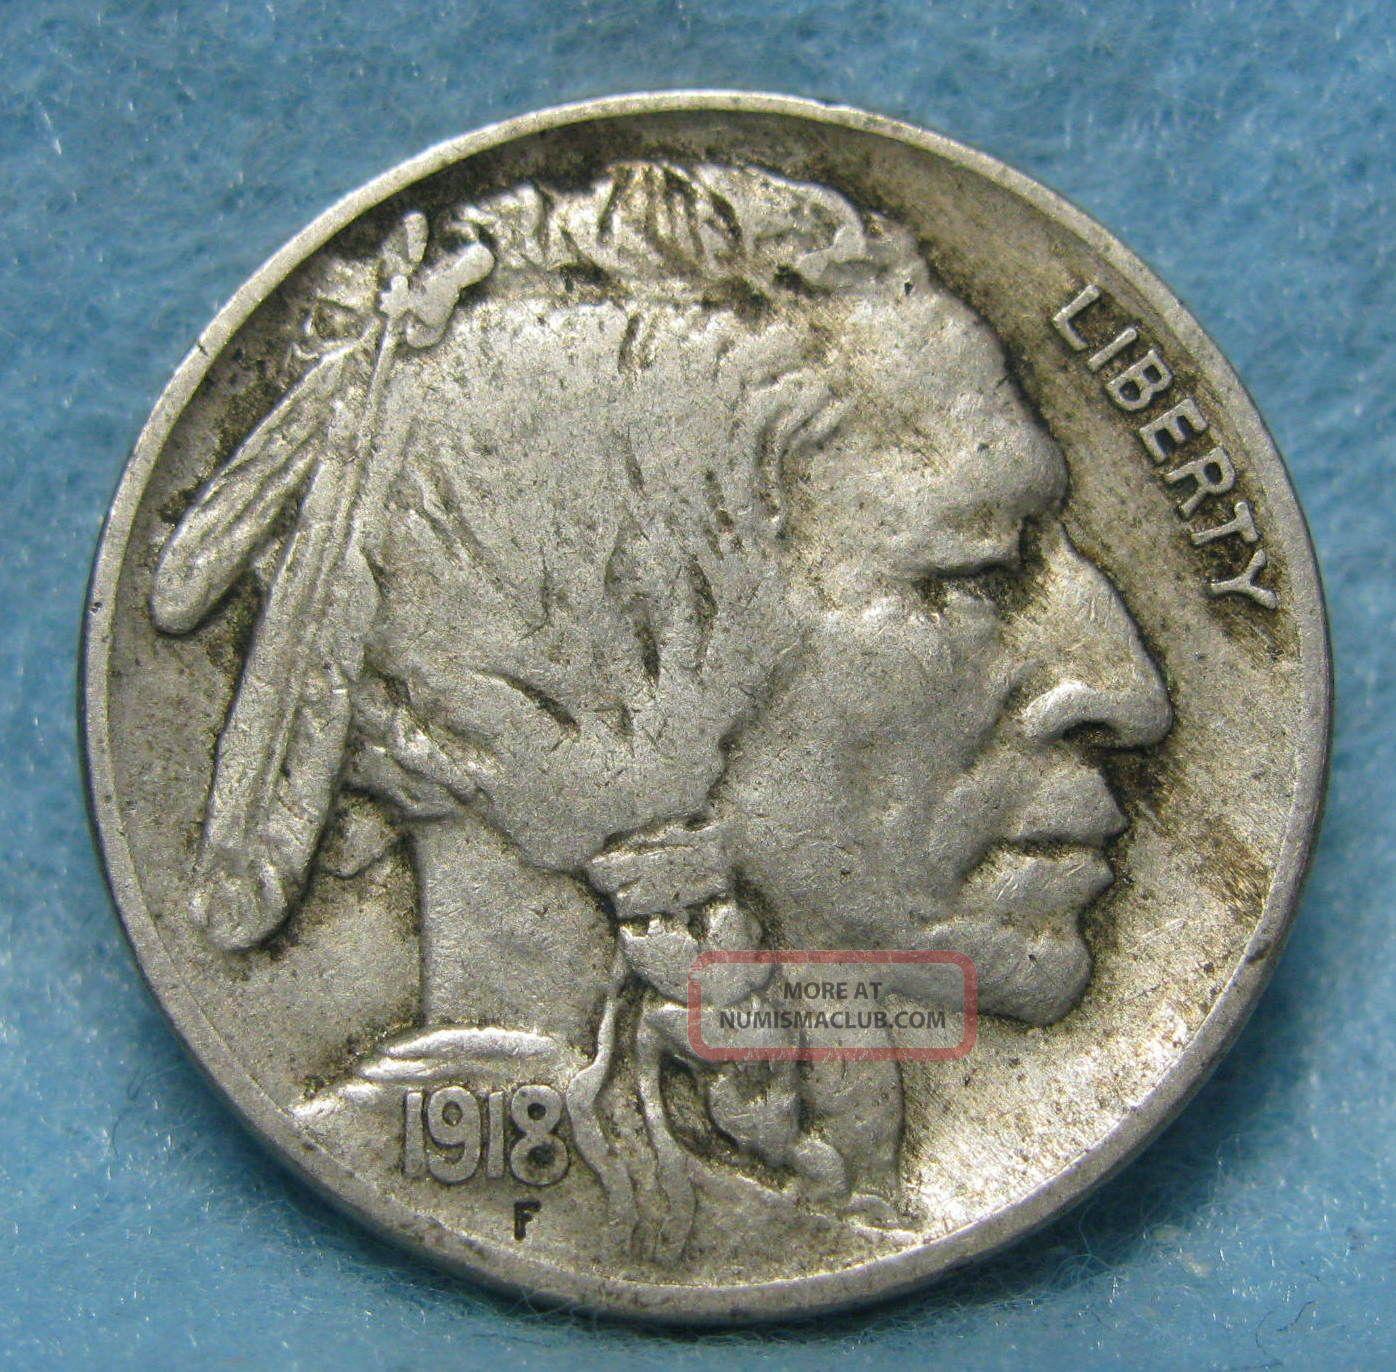 1918 Buffalo Nickel Xf